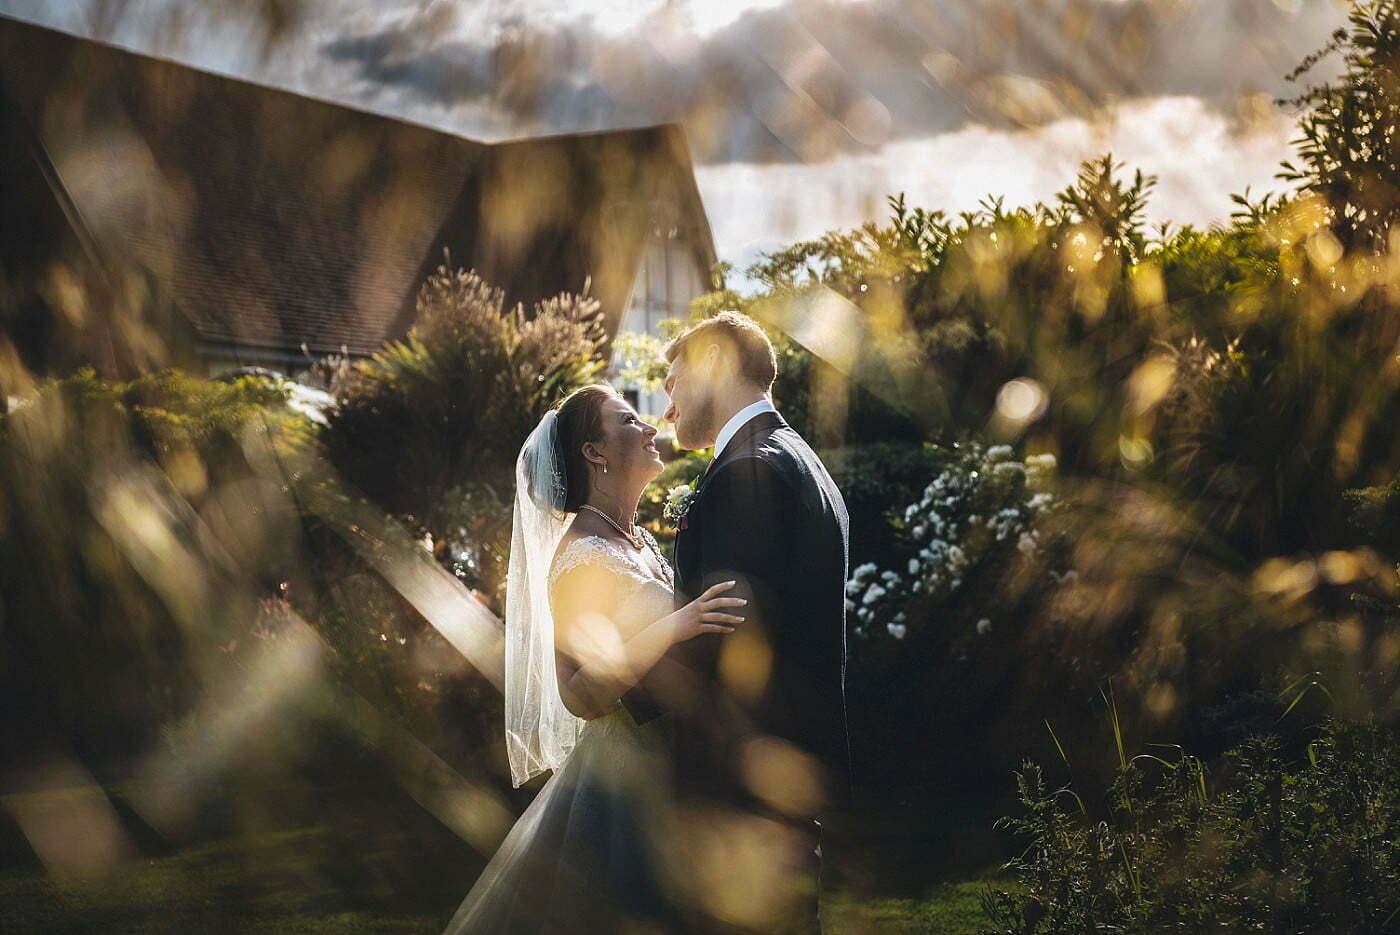 Redhouse Barn wedding photography